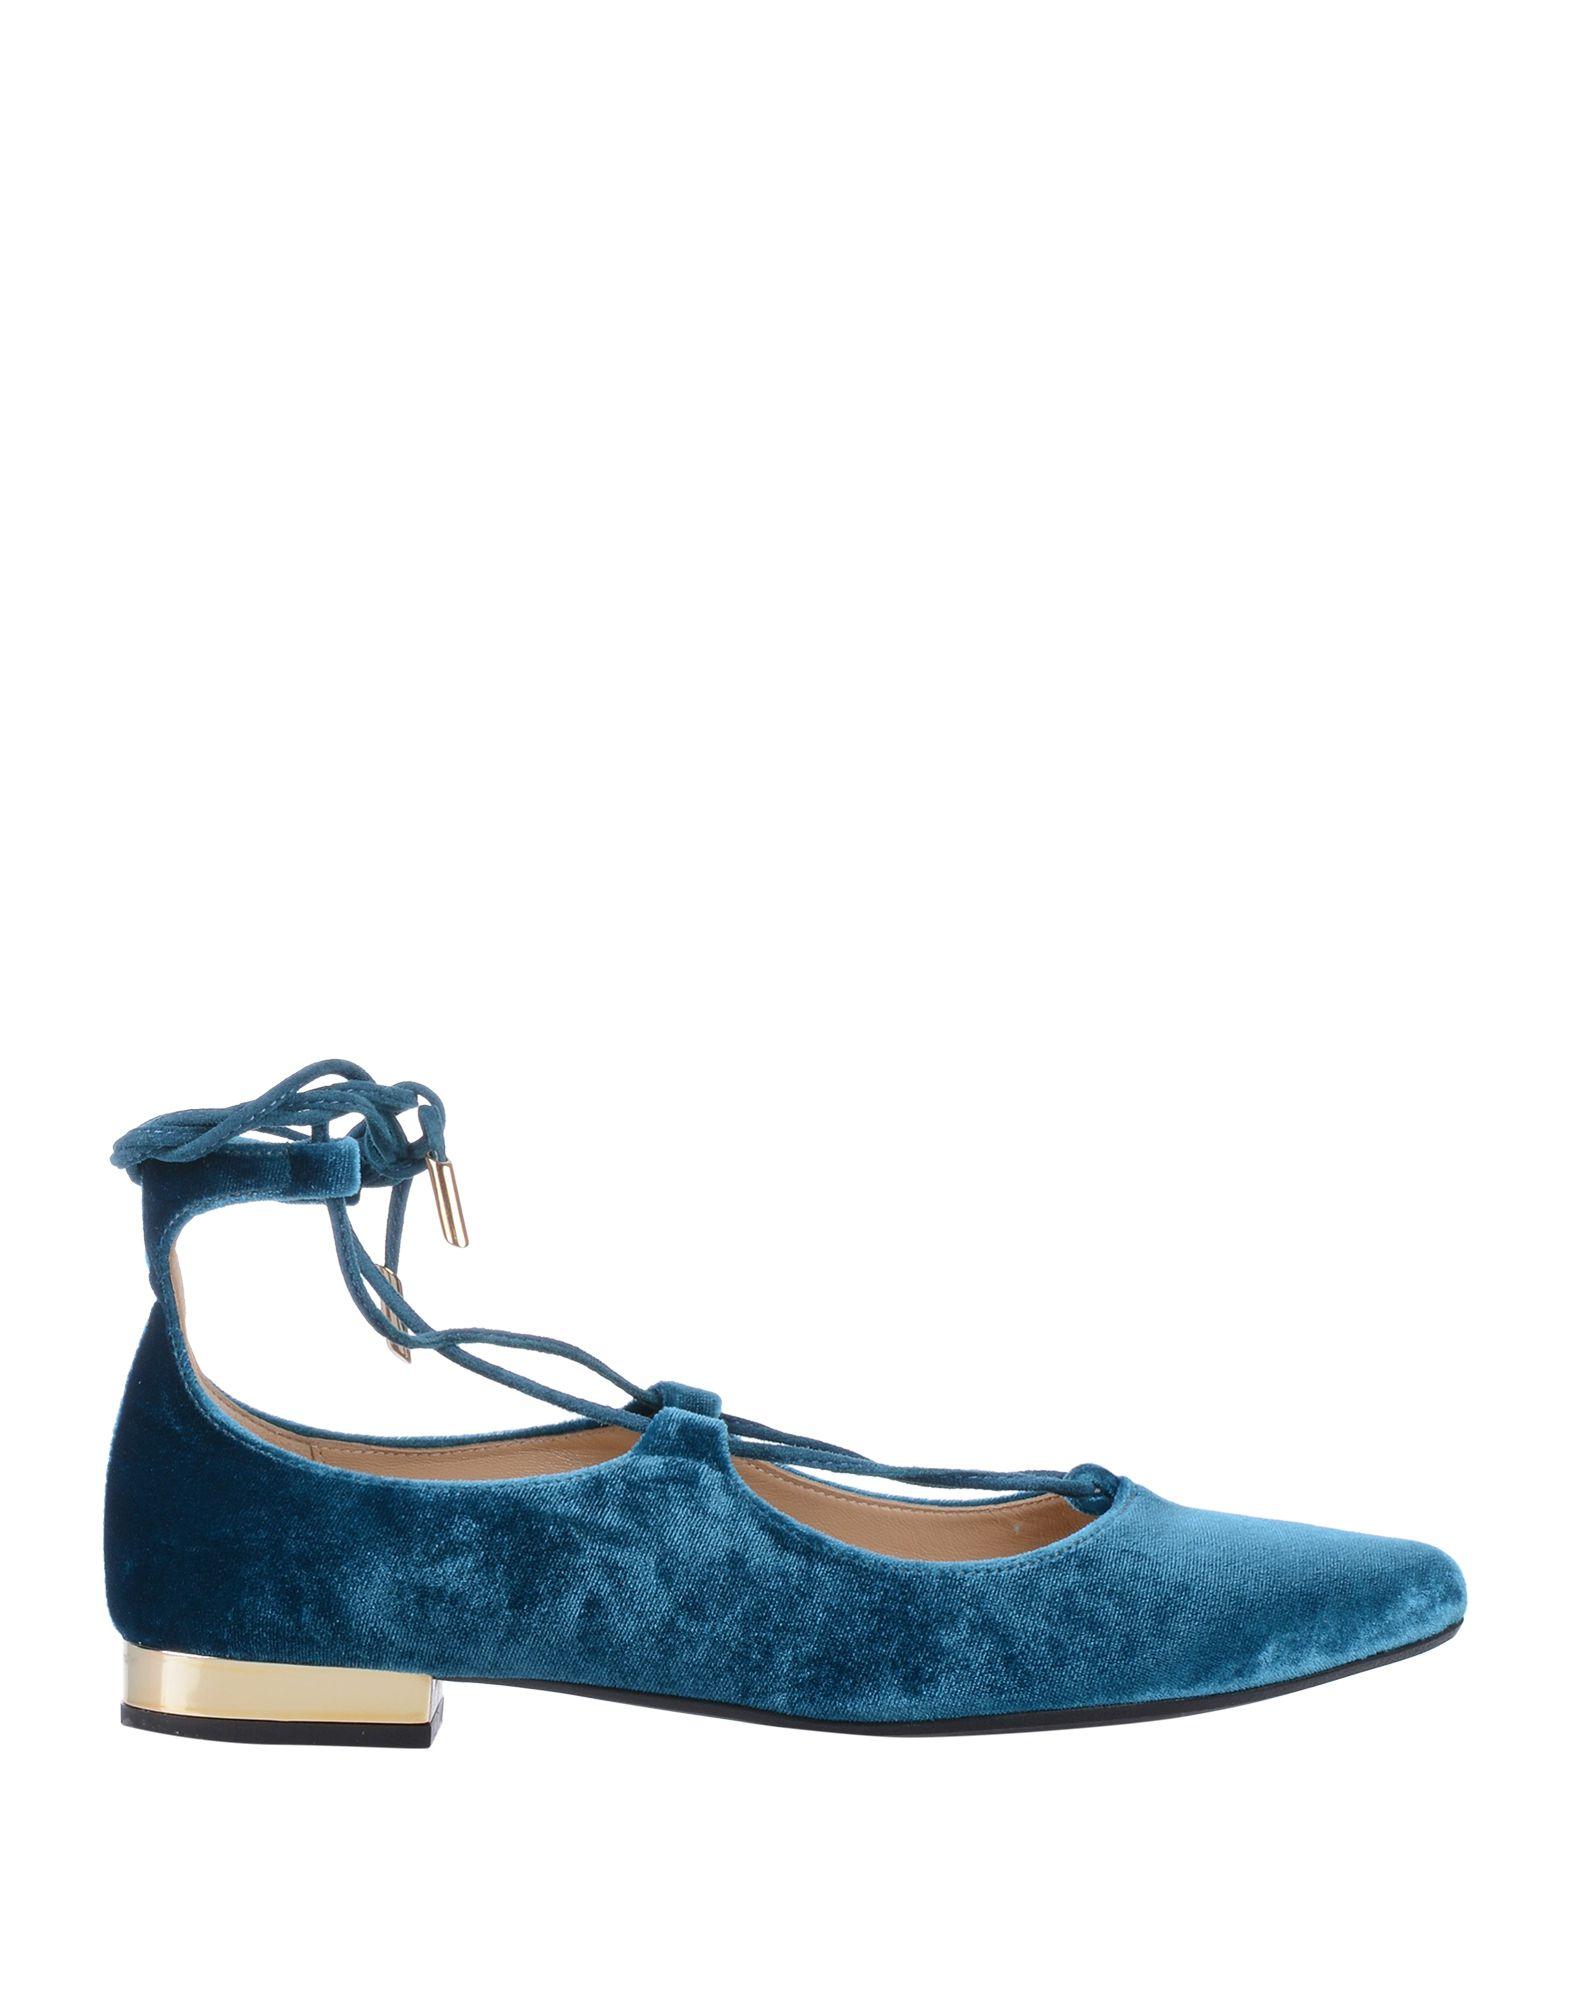 Lea-Gu Ballet Ballet Flats - Women Lea-Gu Ballet Ballet Flats online on  Australia - 11527579VS ea1047